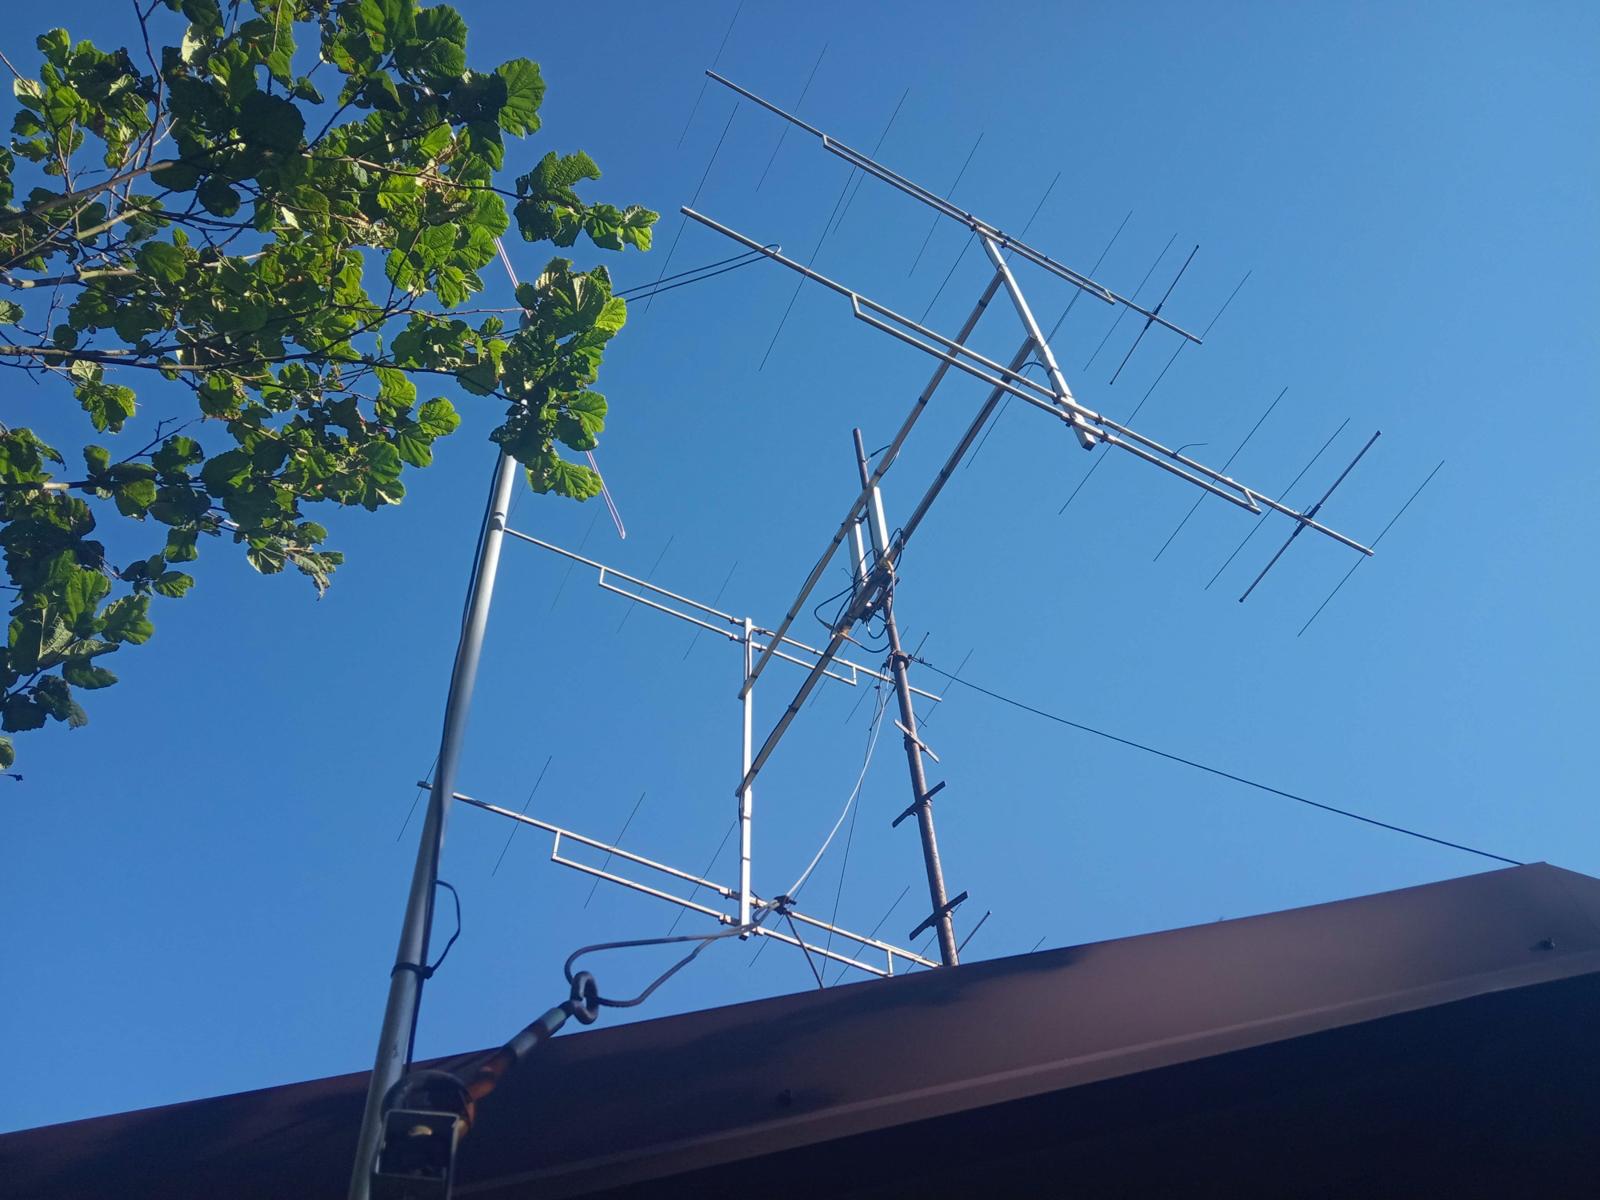 OM3KOM-Antennen in JN98dv